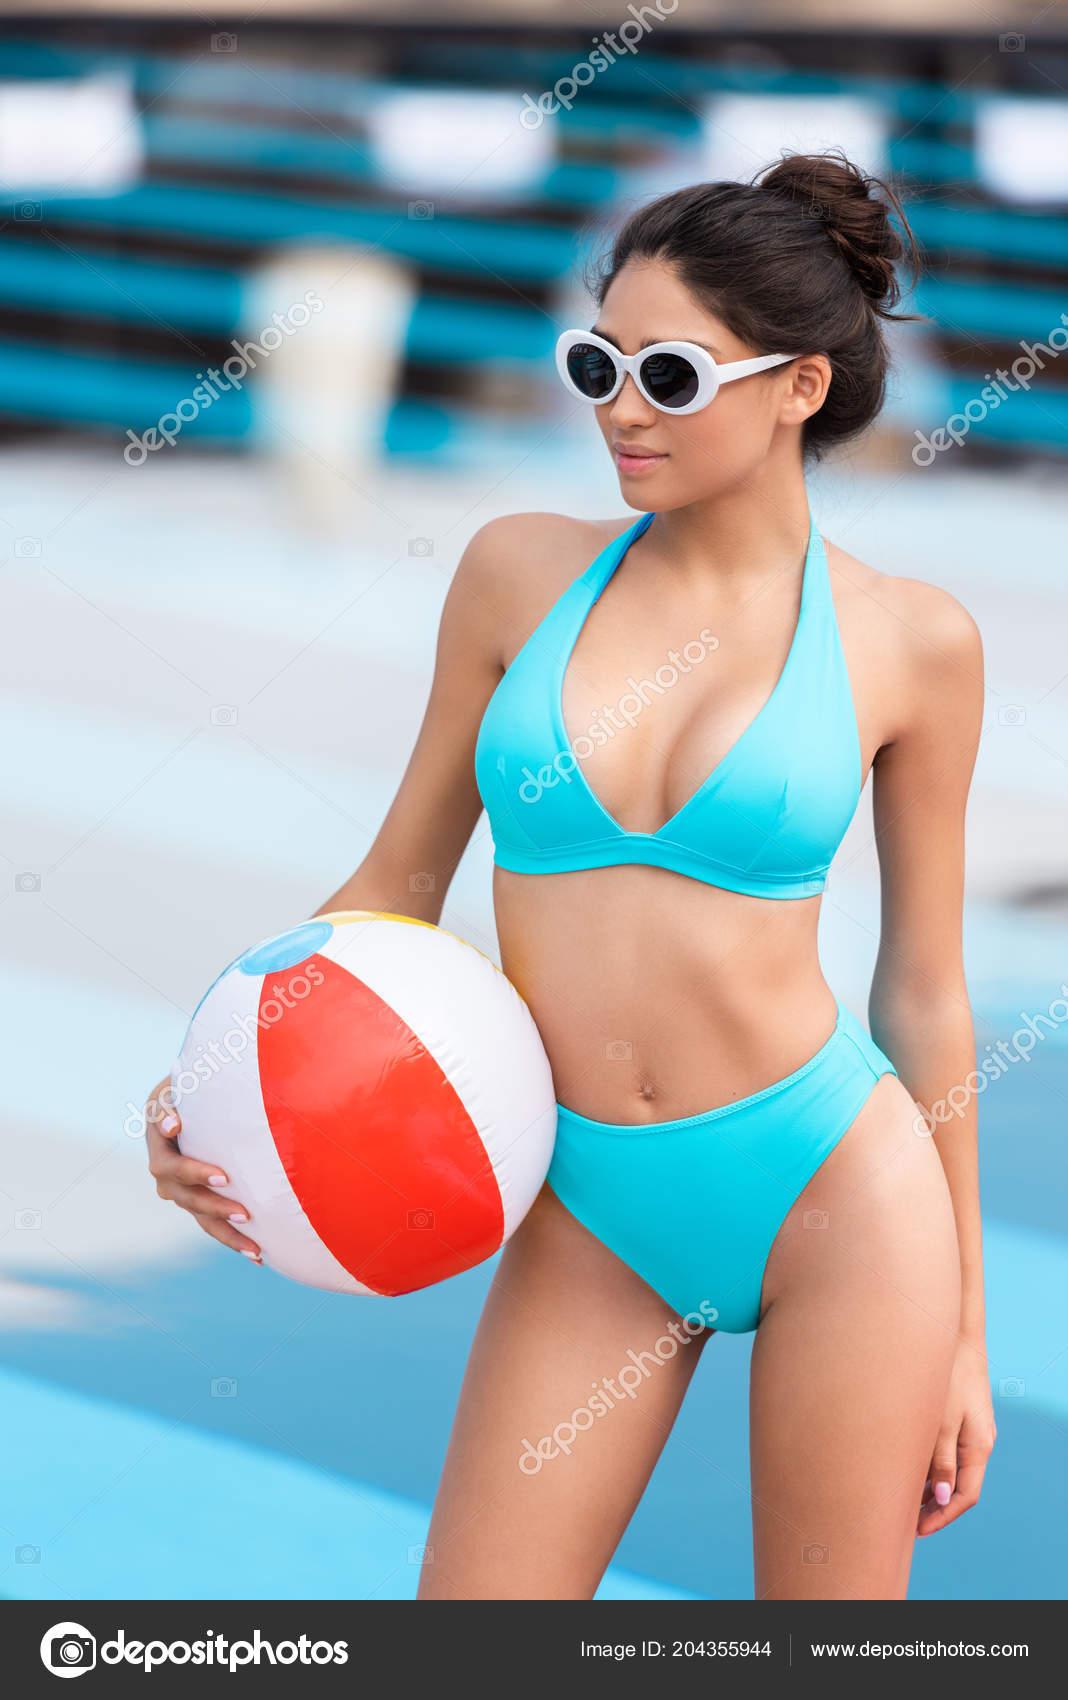 55ed7e765e869 Красивая Девушка Бикини Солнцезащитные Очки Надувной Мяч Бассейна ...